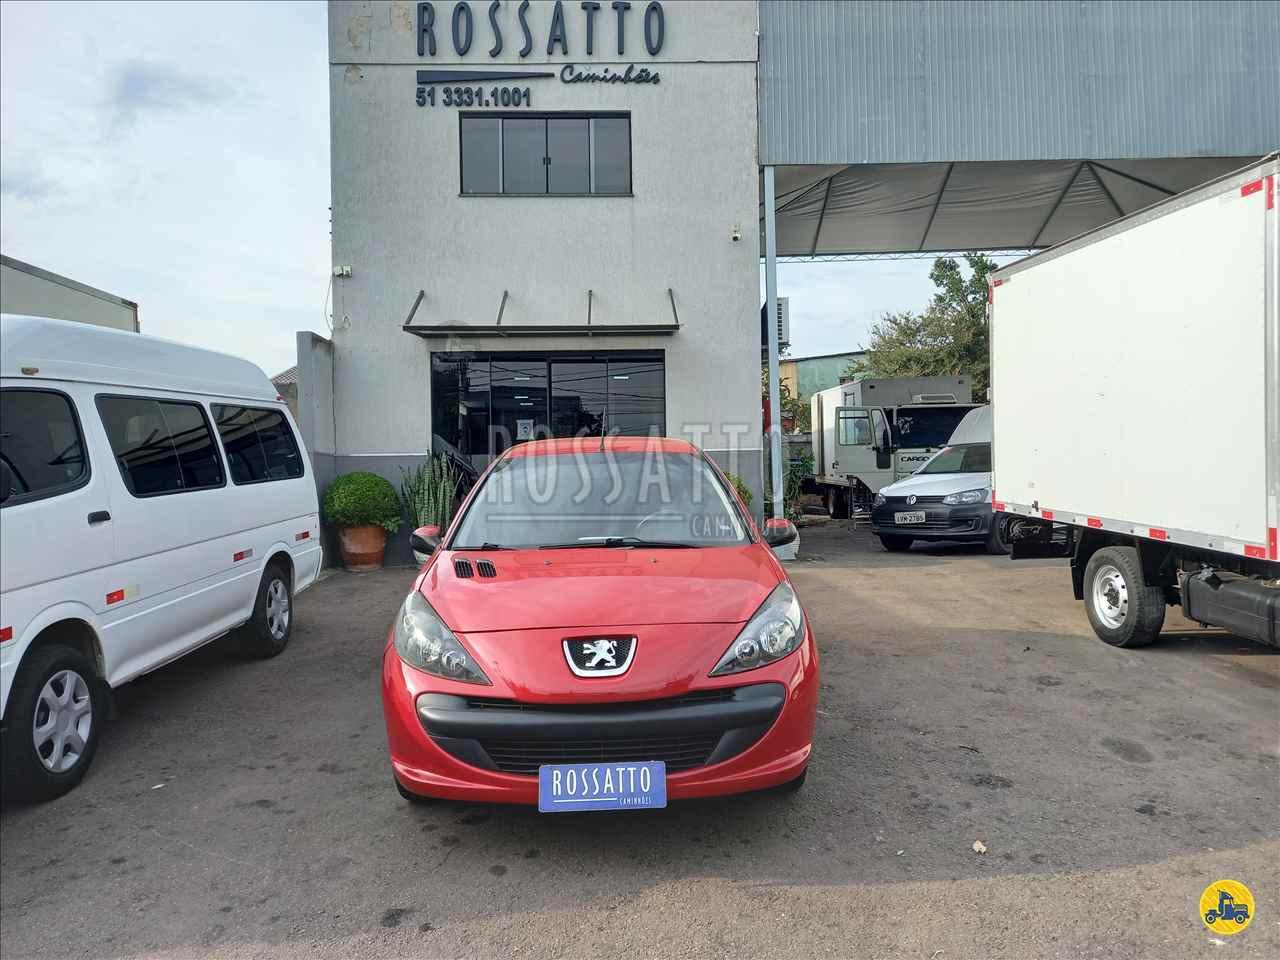 PEUGEOT 207 1.4 XR 880000km 2012/2013 Rossatto Caminhões